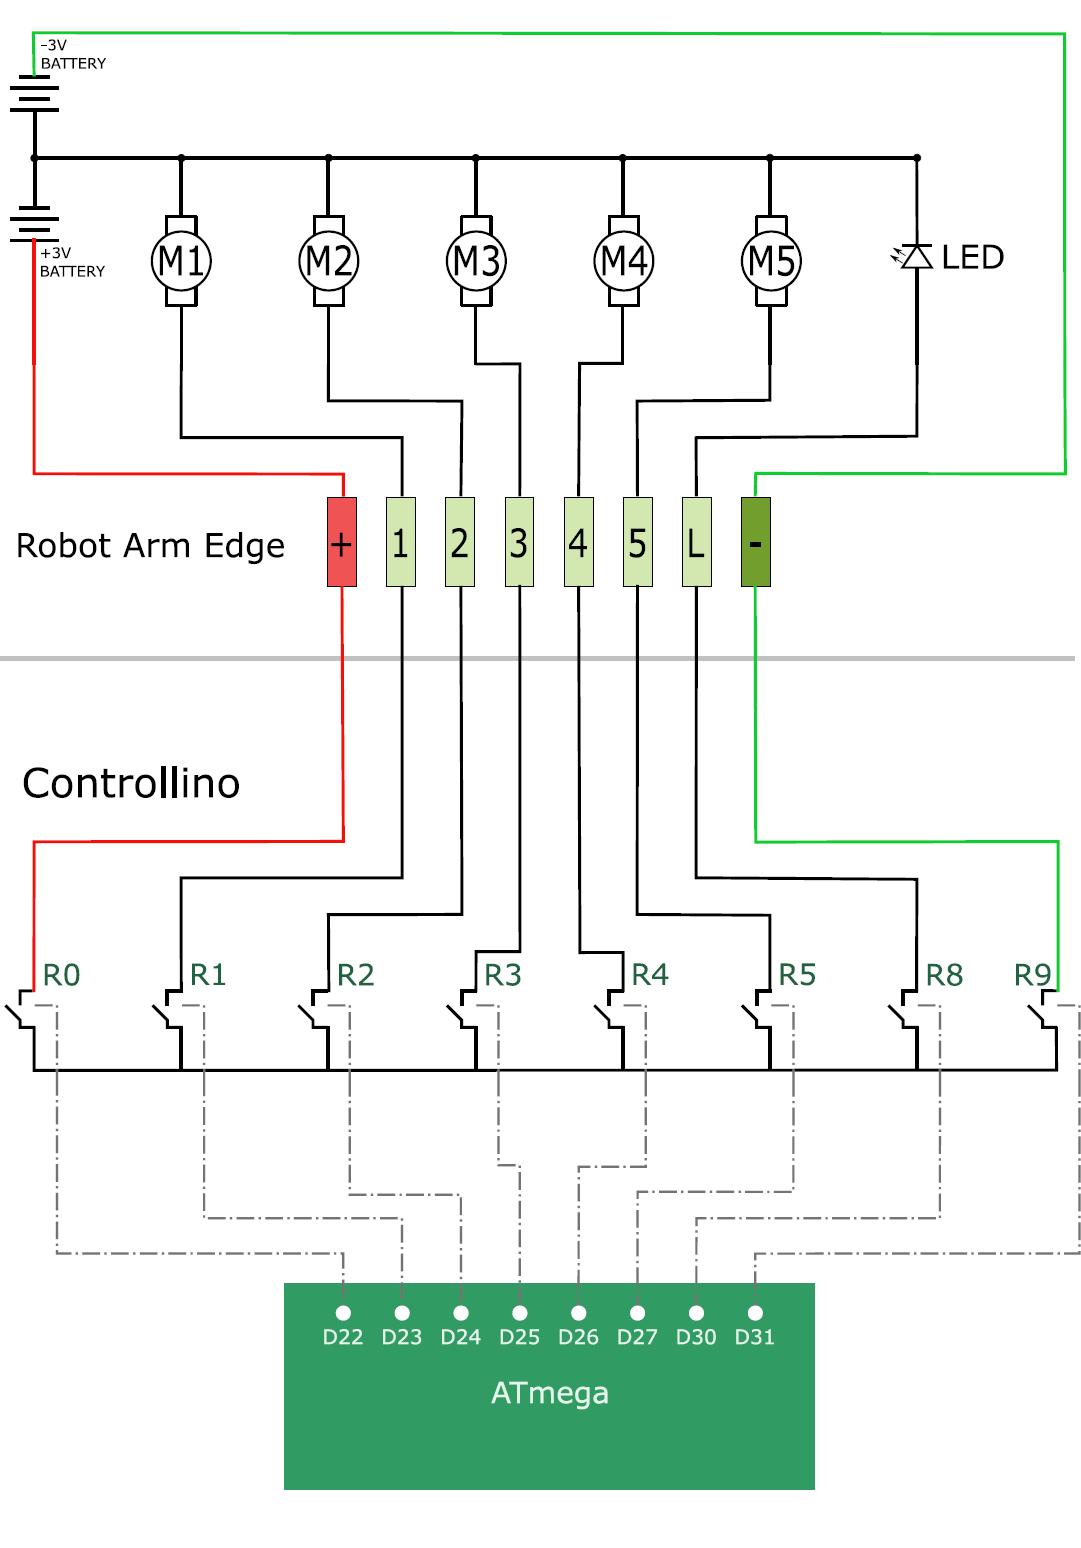 Owi robot arm with controllino circuit diagram 4g9jlylhew